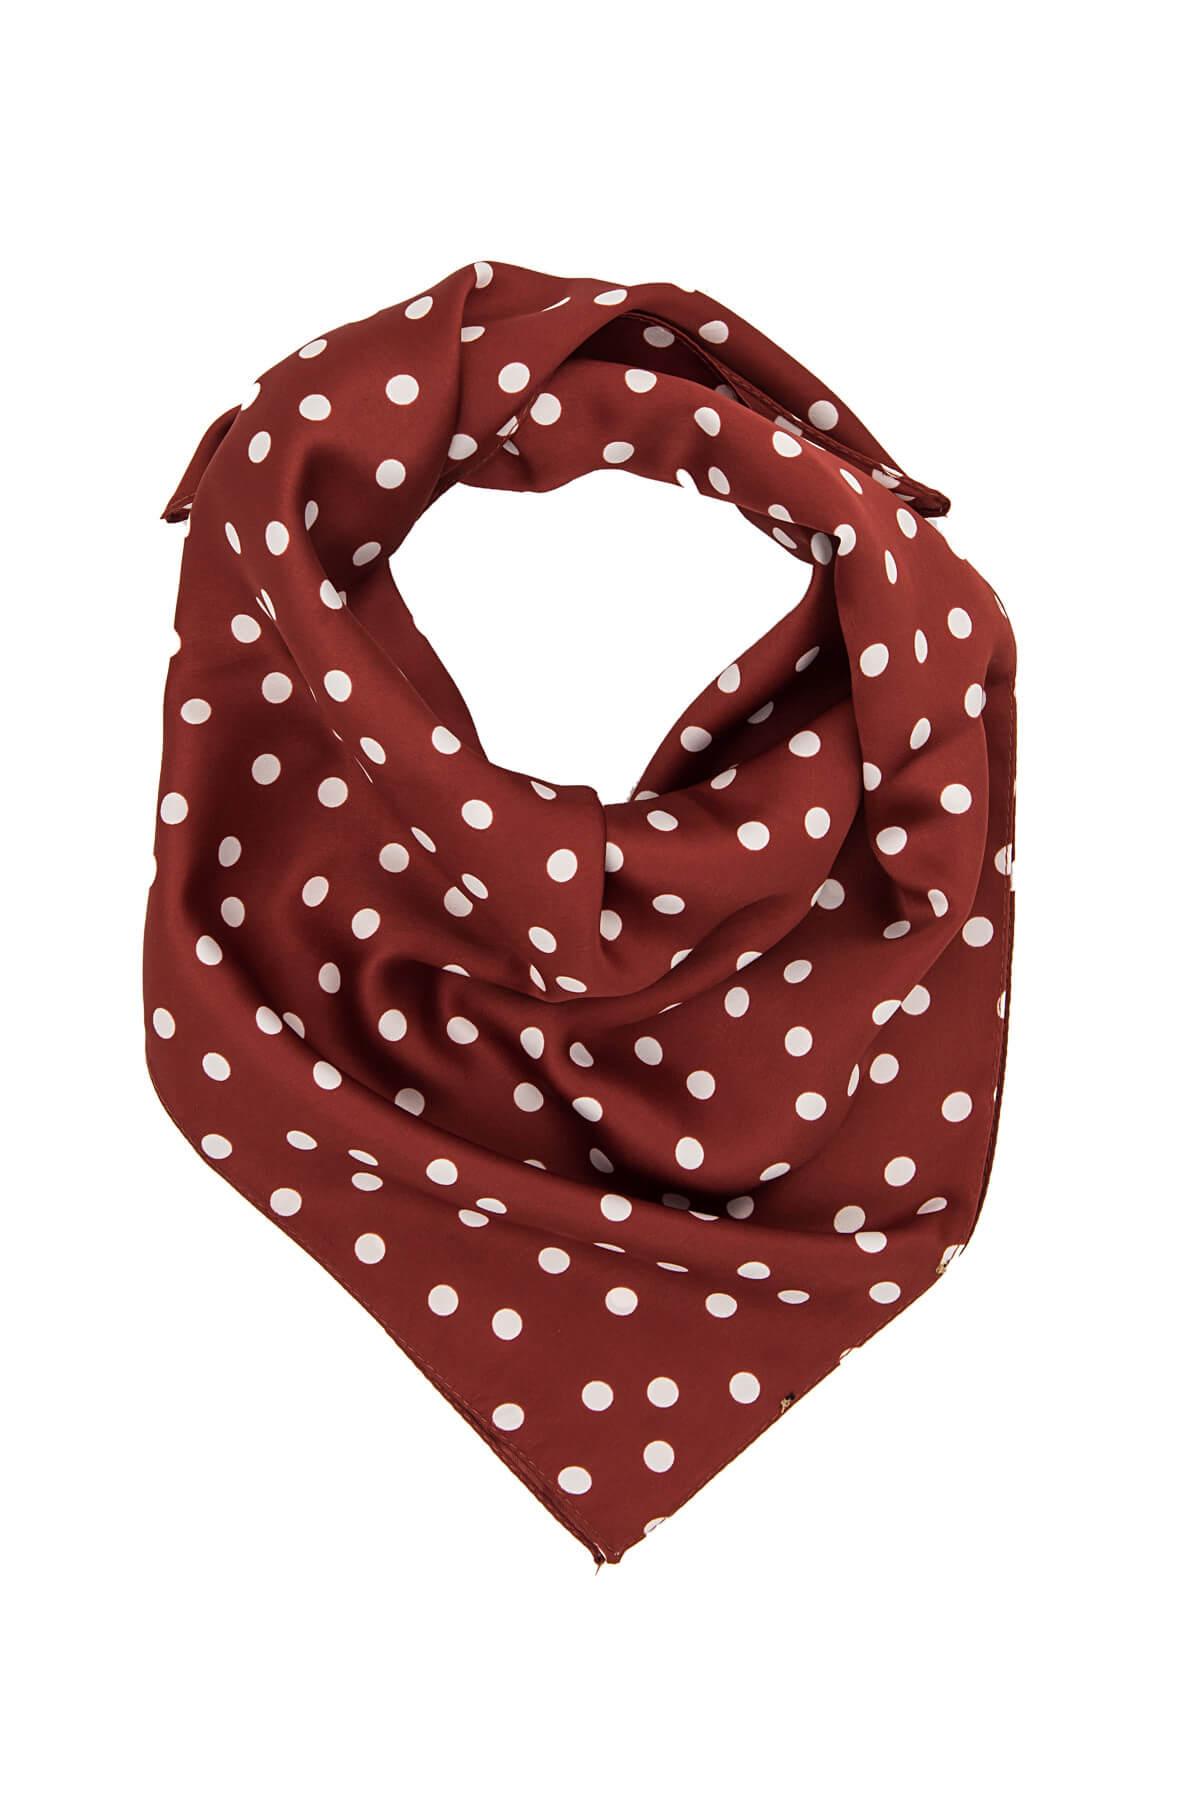 Trendyol Burgundy Polka-Dot Patterned Scarf